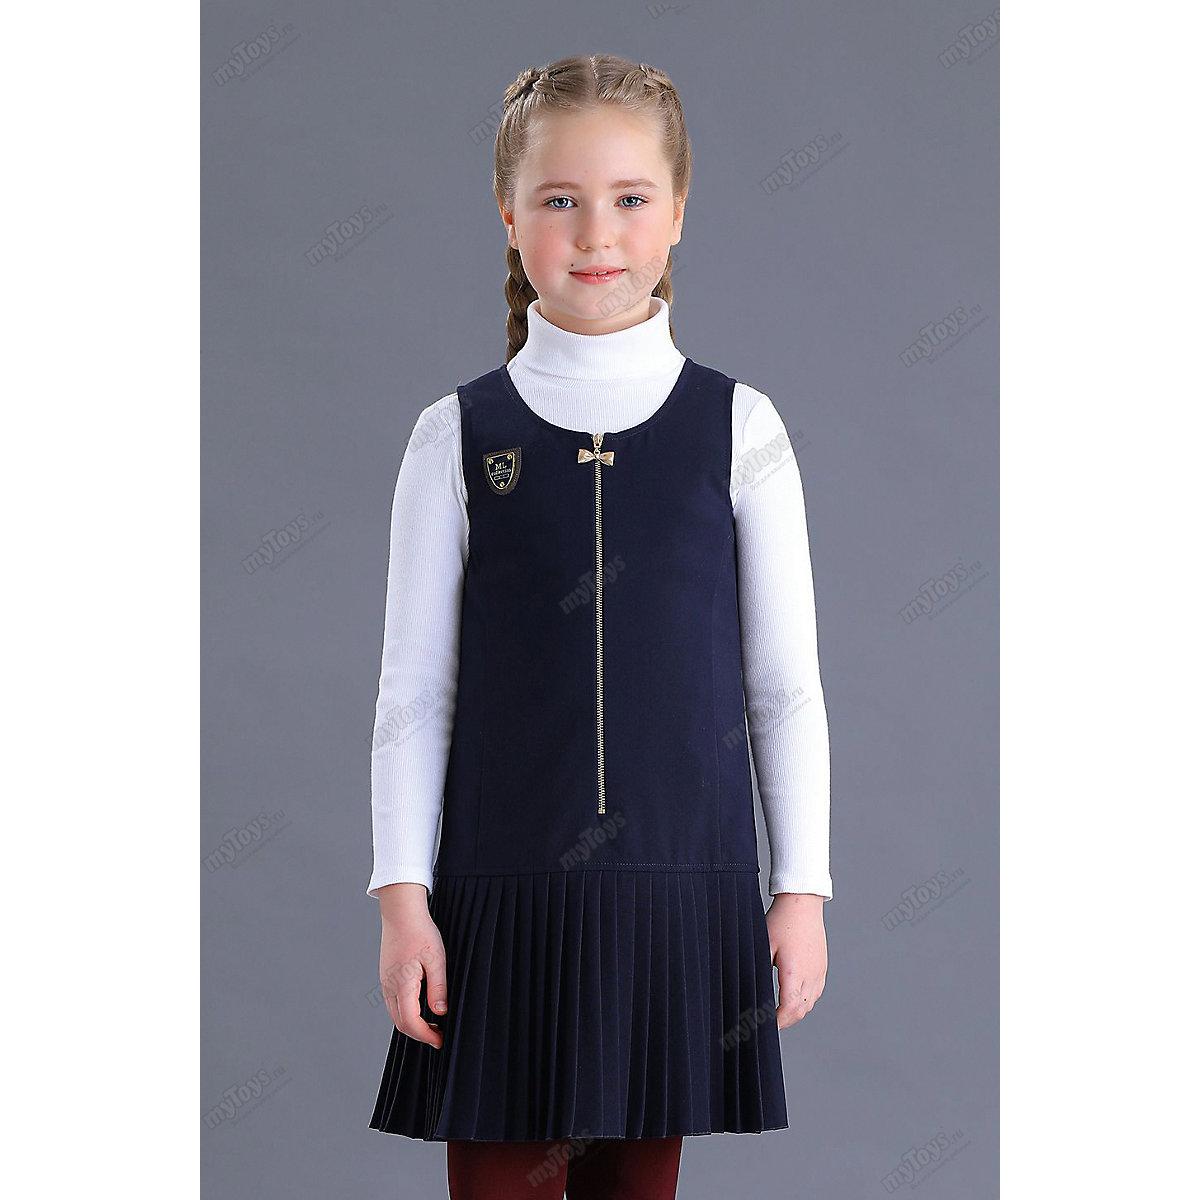 МАЛЕНЬКАЯ ЛЕДИ Dresses 11686184 school uniform dark blue for girls Formal Sleeveless Pleat blue backless design stitching v neck sleeveless sexy dress